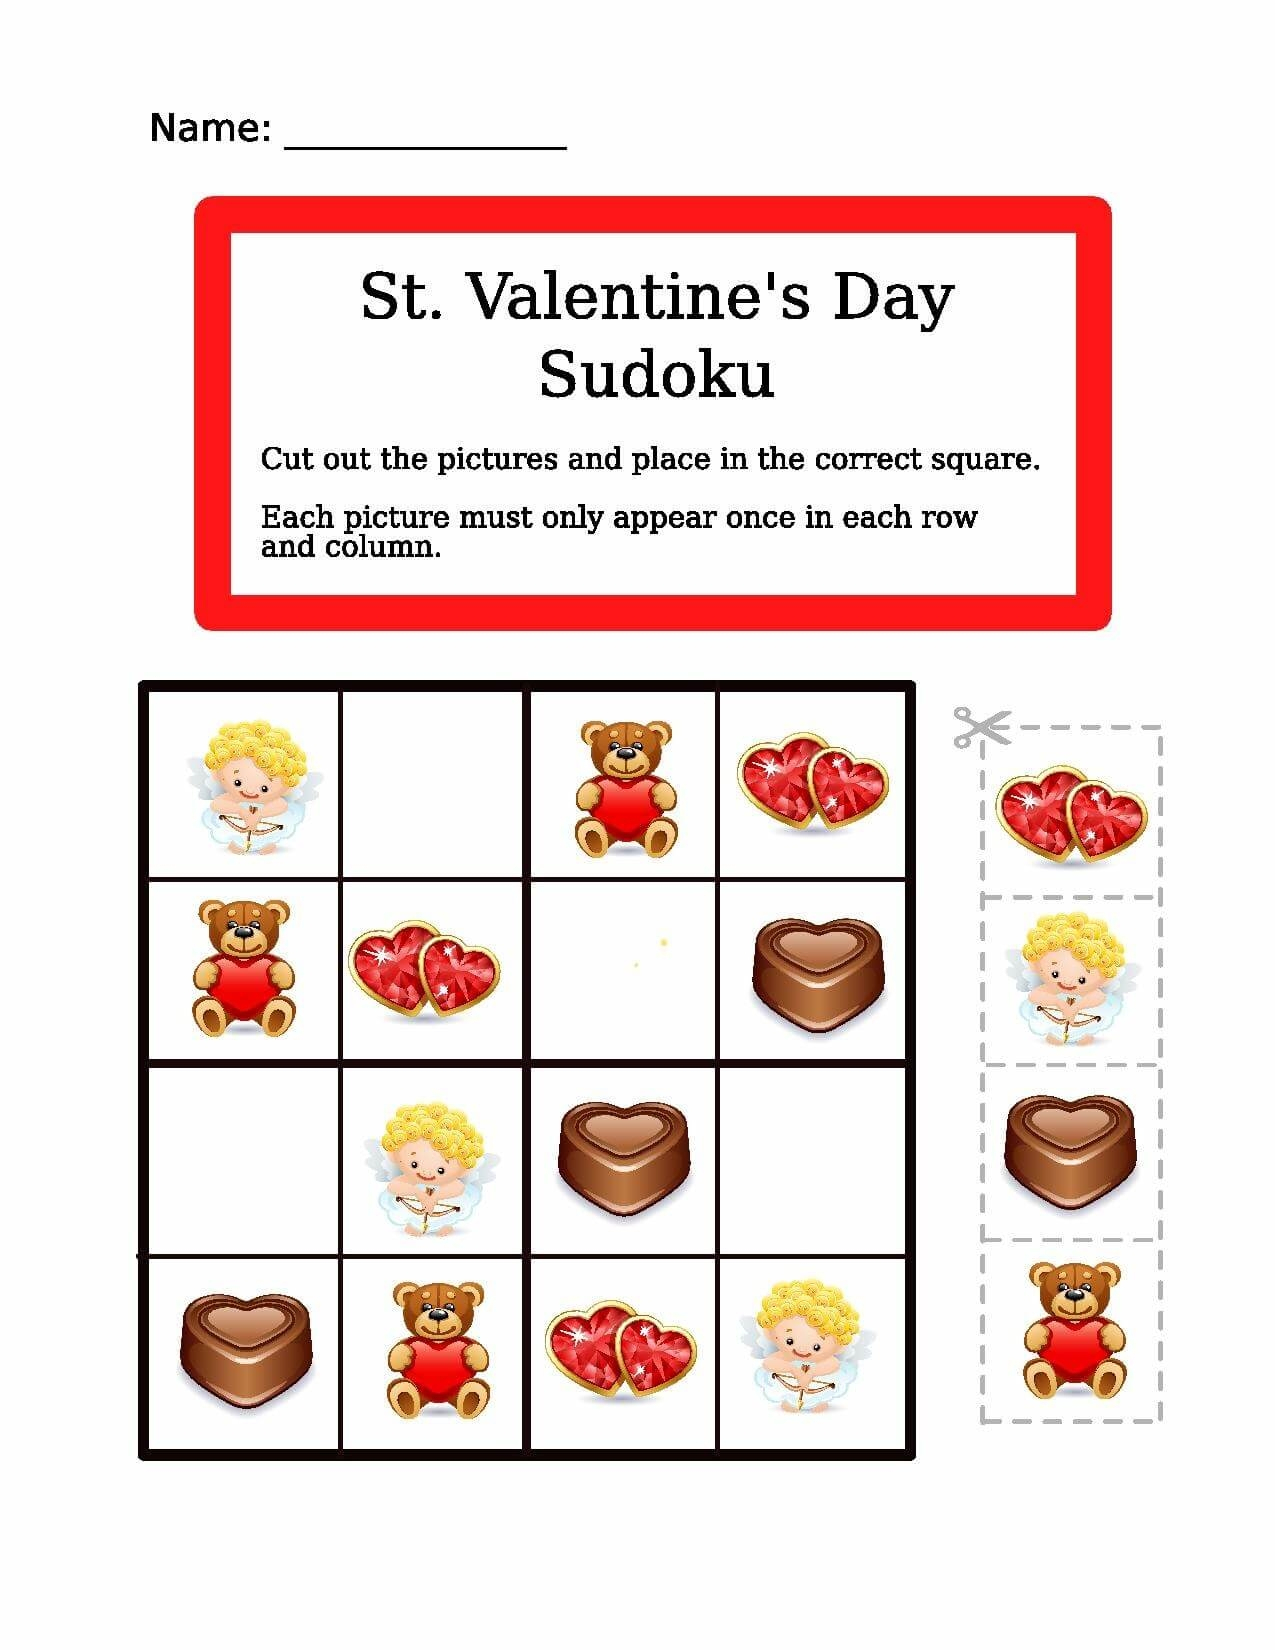 Saint Valentine Picture Sudoku | Free Printable Puzzle Games